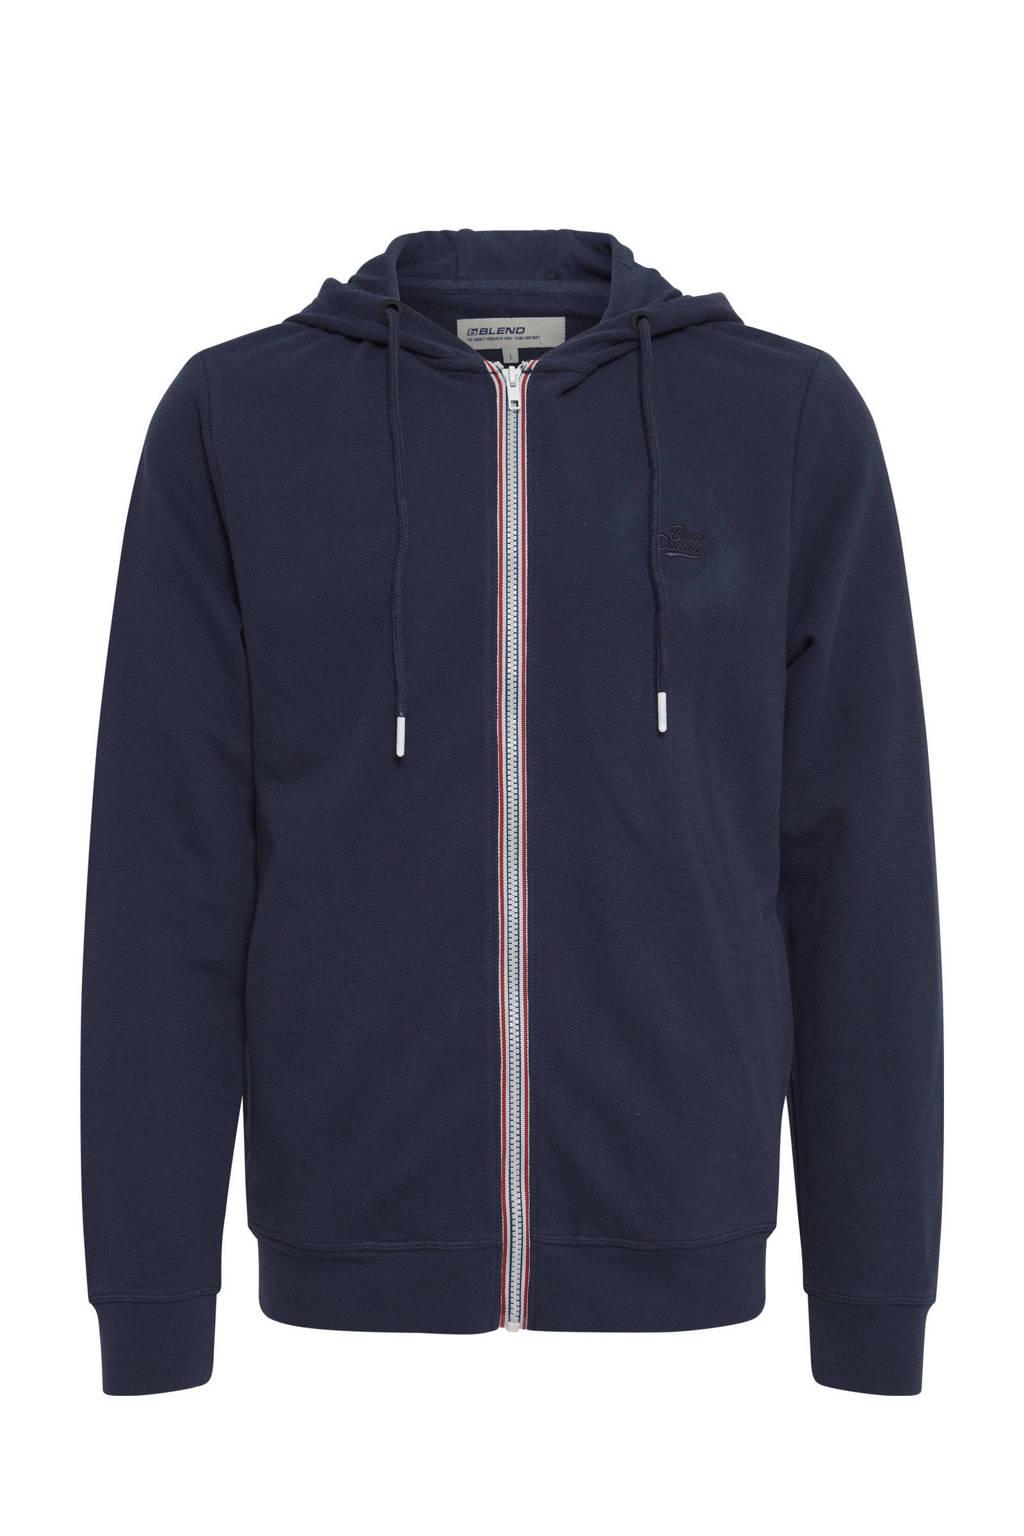 Blend Big vest Plus Size donkerblauw, Donkerblauw